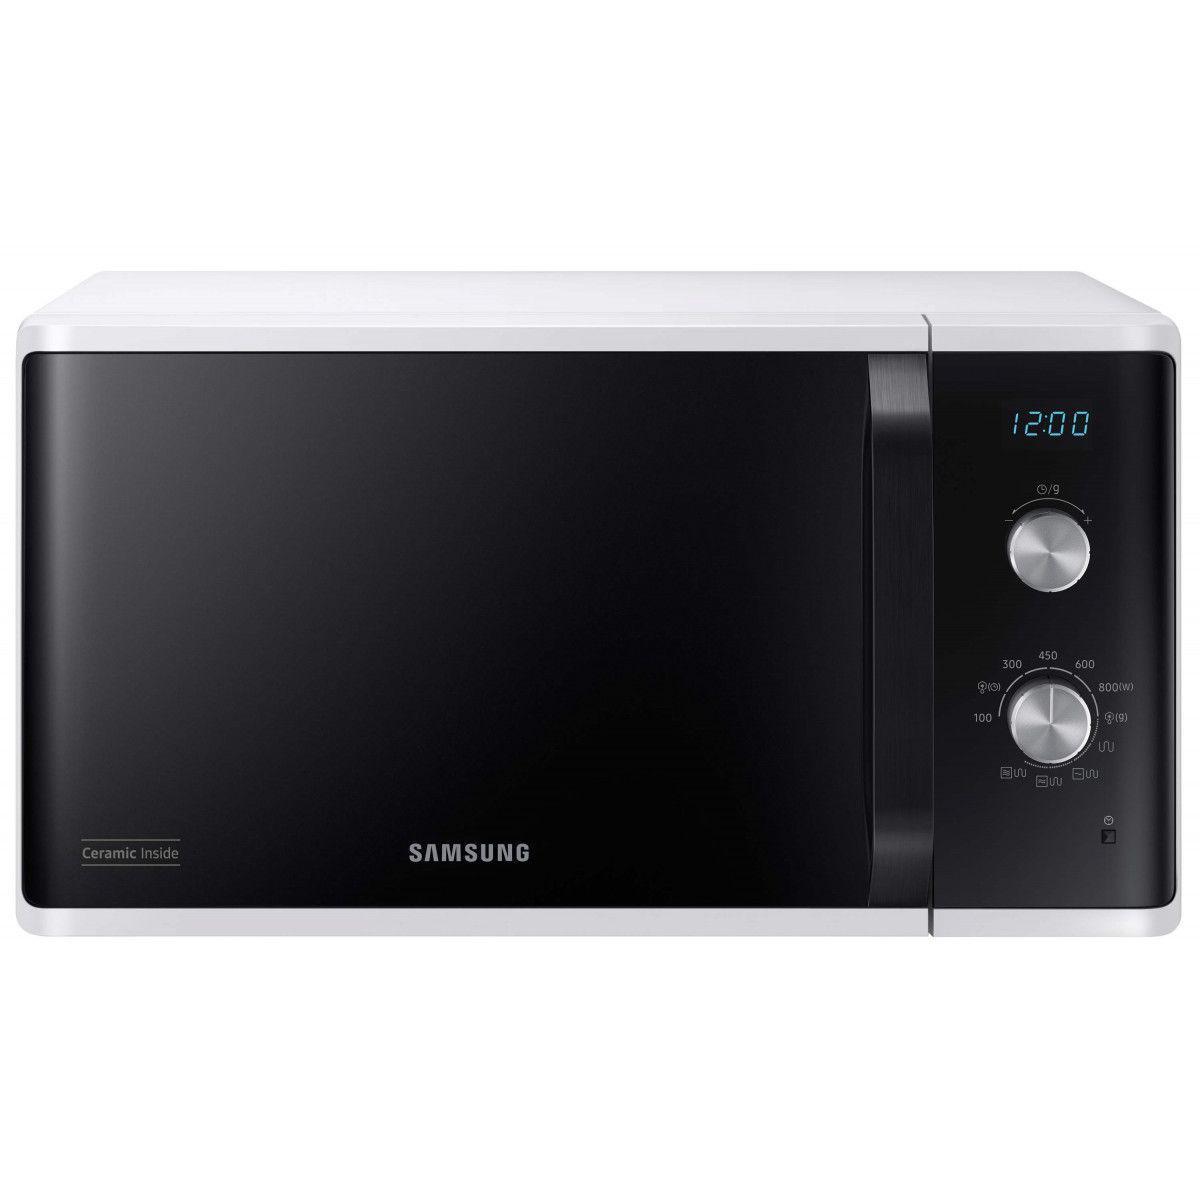 Samsung Micro-ondes Pose Libre 27l Samsung 1250w 33cm, Mg 23 K 3614 Aw